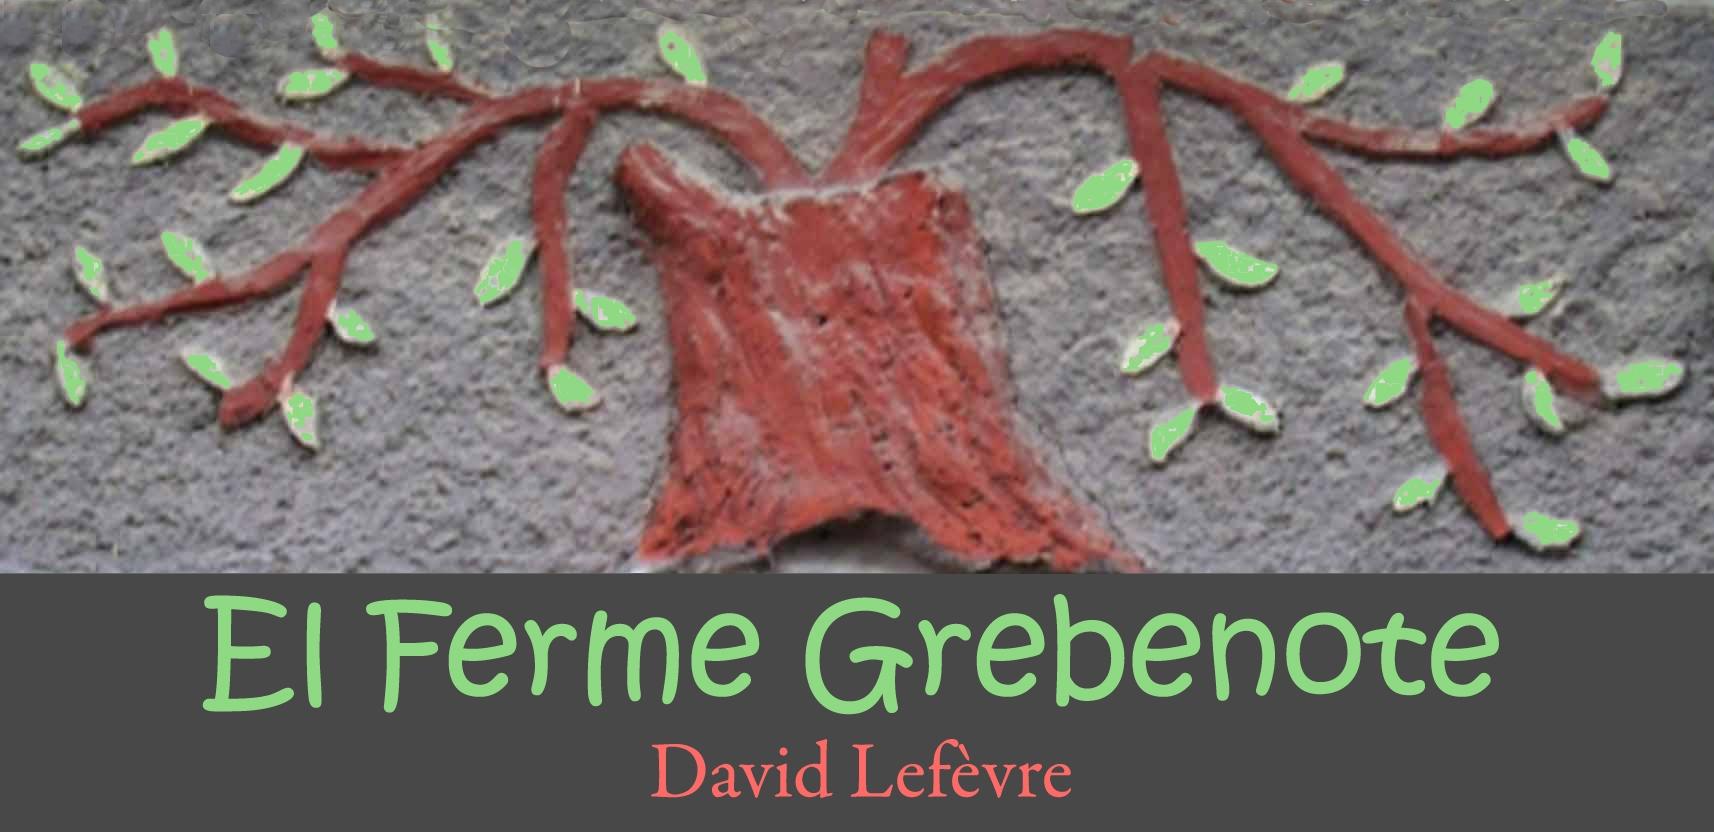 http://grebenote.com/cinse/wp-content/uploads/2010/06/LOGO-GREBENOTE-officiel.jpg